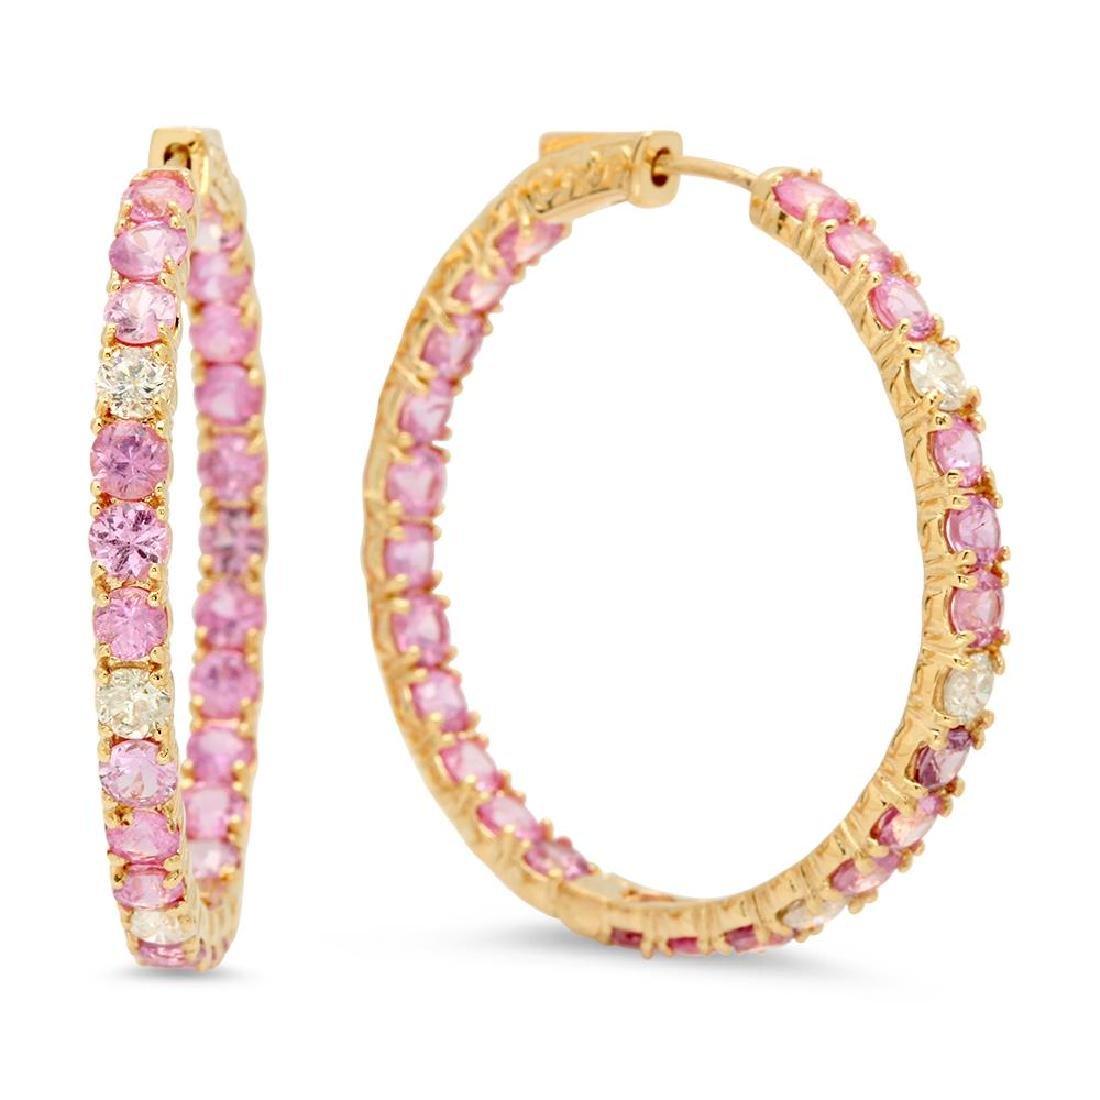 14K Gold 8.11ct Pink Sapphire 0.90cts Diamond Earrings